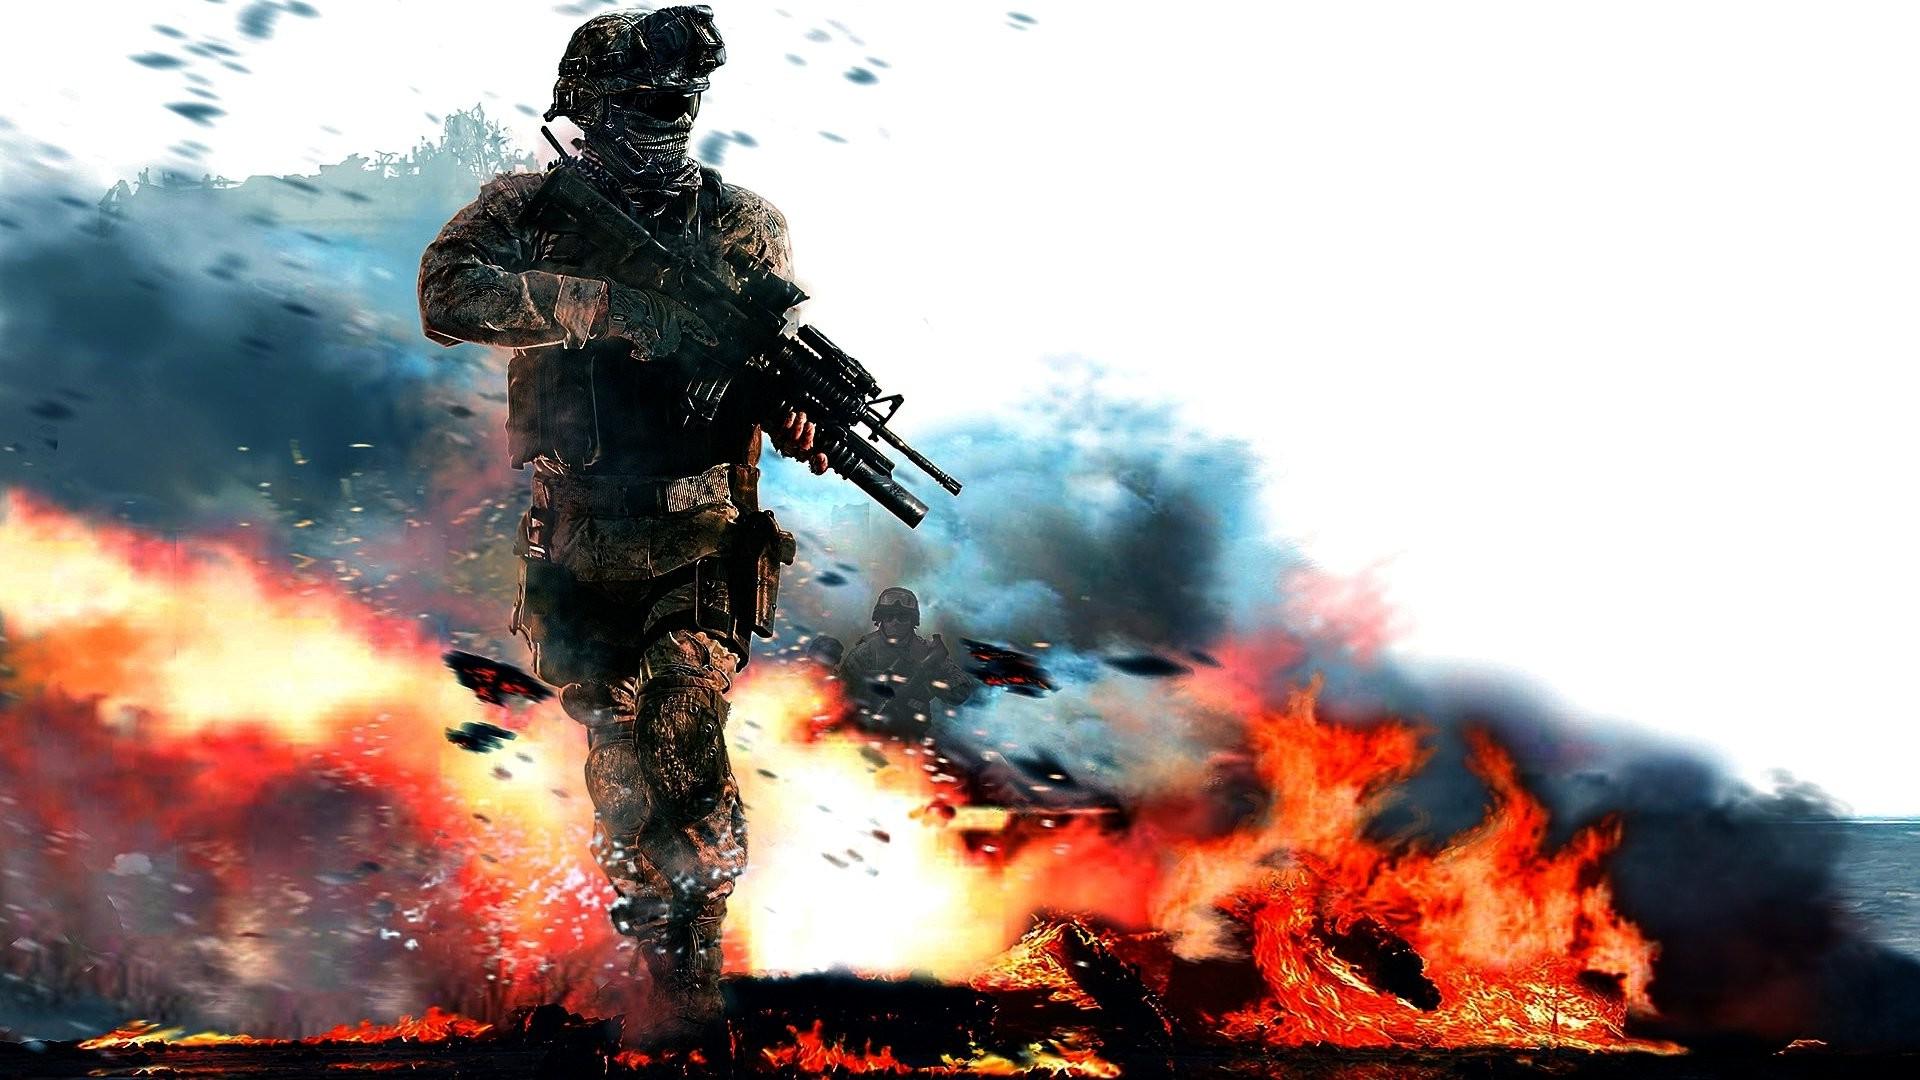 wallpaper : 1920x1080 px, call of duty modern warfare 2, soldier